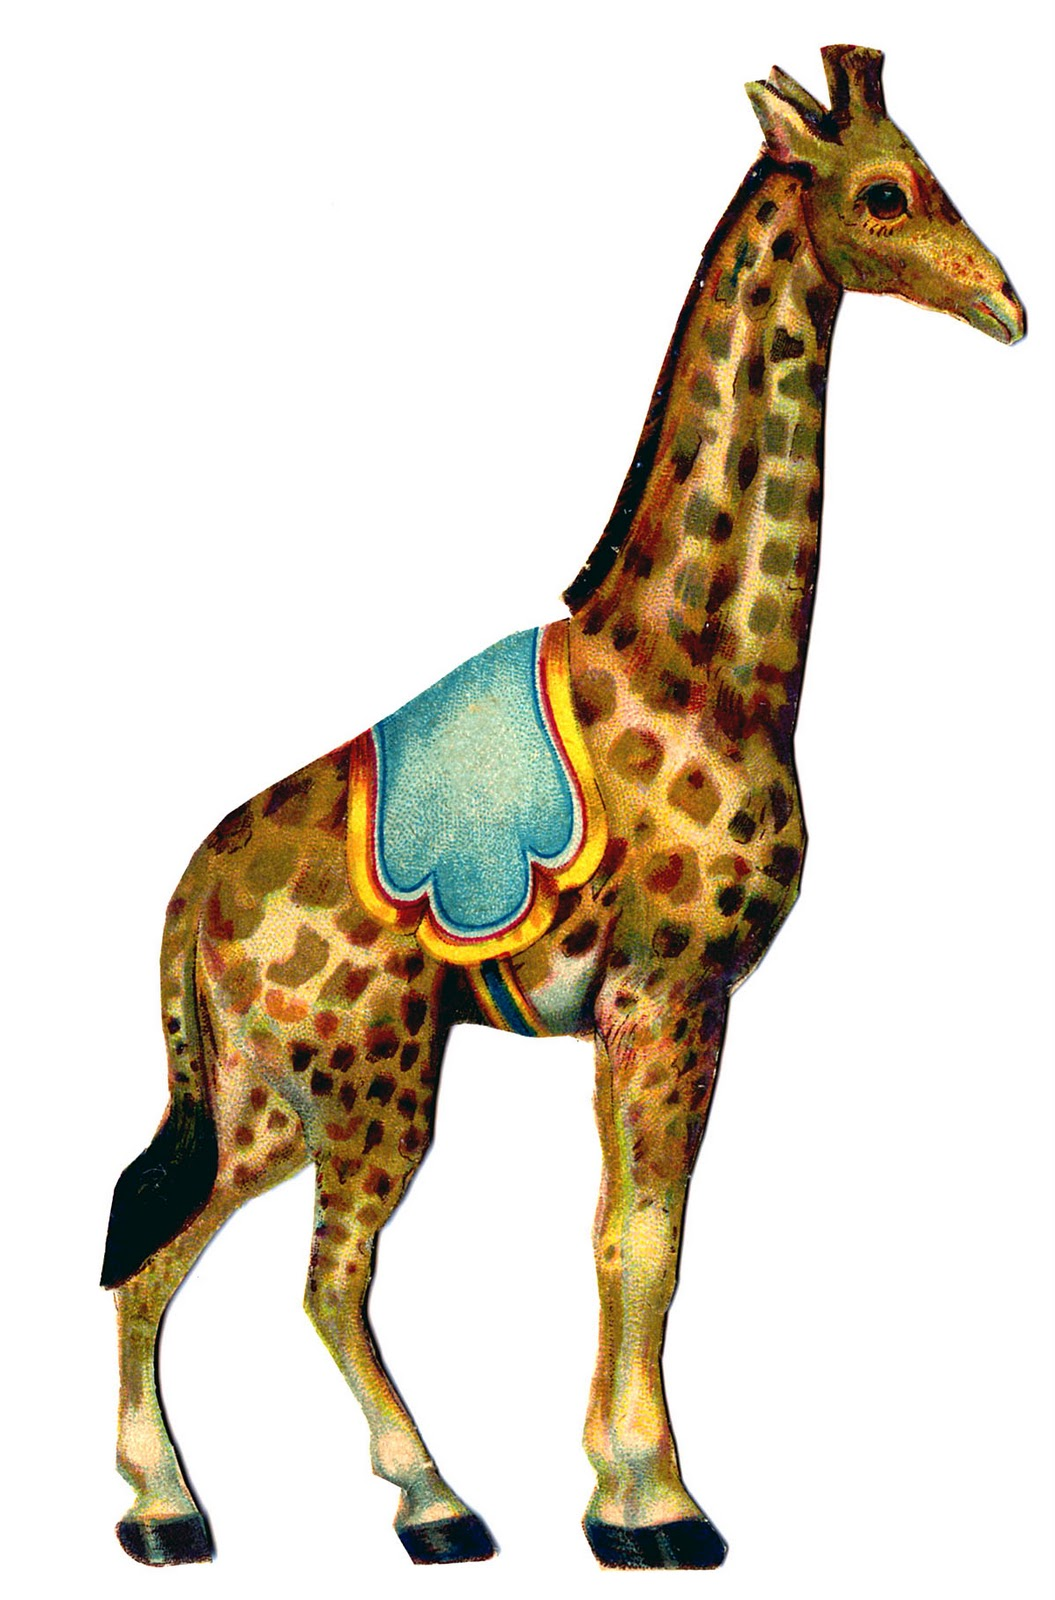 http://thegraphicsfairy.com/wp-content/uploads/blogger/-mUziCMT3fX0/TyiVwqMSKzI/AAAAAAAAQbU/UQhqBh01BNA/s1600/giraffe%2Bcircus%2Bimage%2BGraphicsFairy008b.jpg